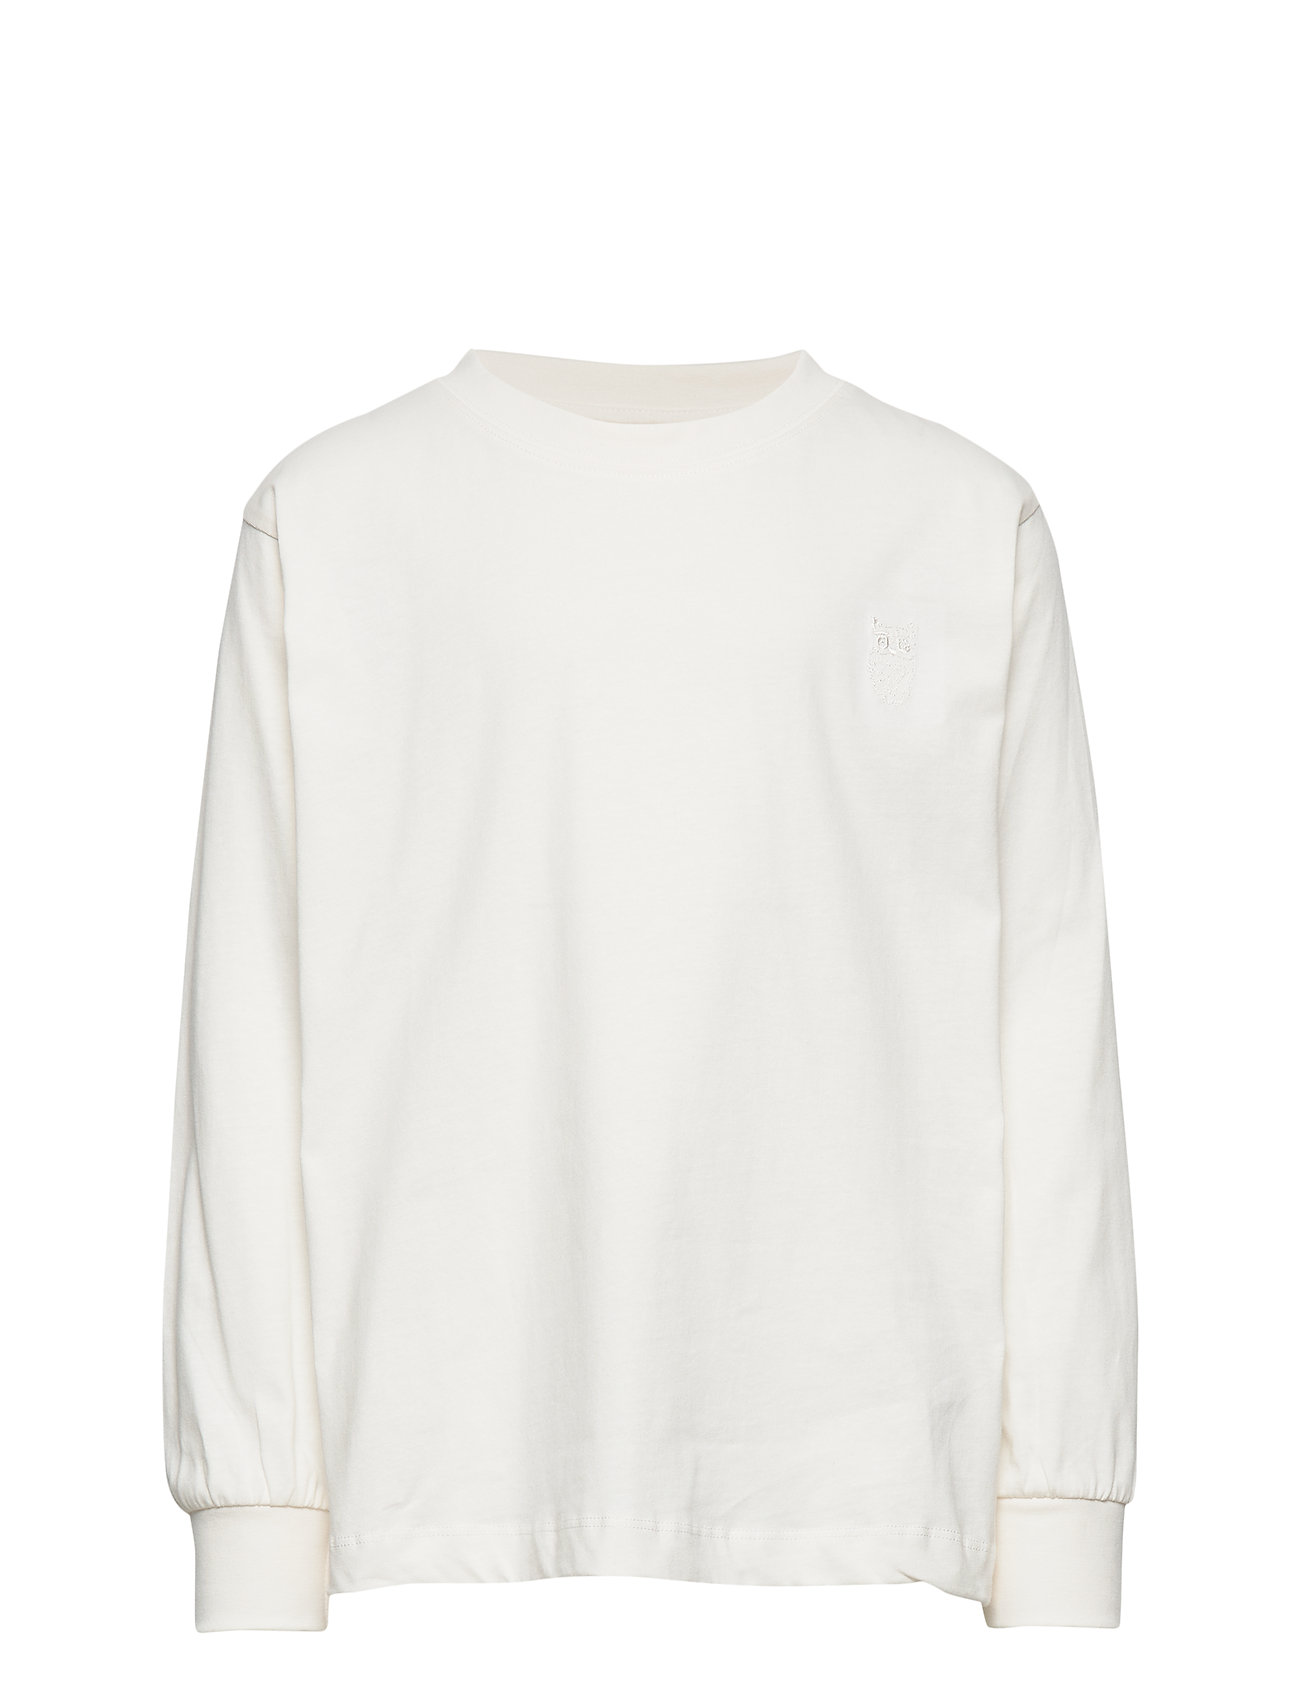 Soft Gallery Benson T-shirt - WHITE, MINI OWL EMB.